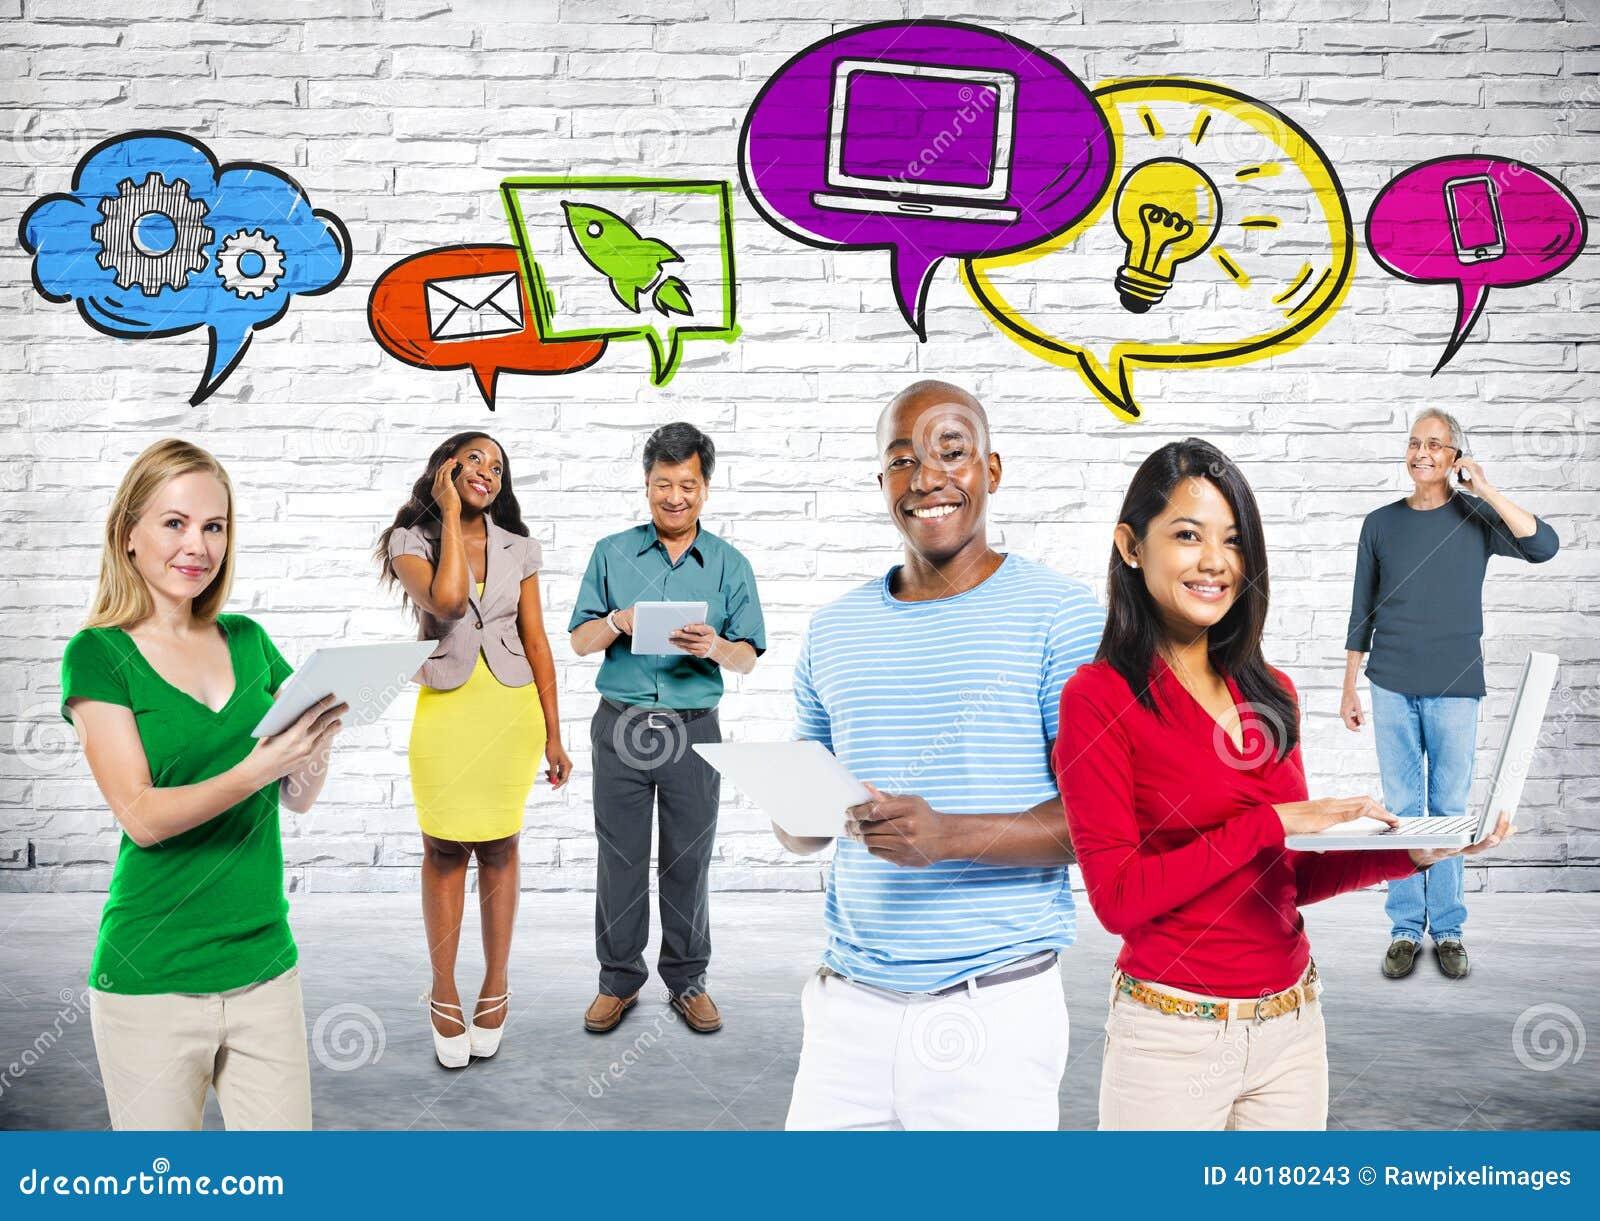 medios de comunicación social africano desprotegido